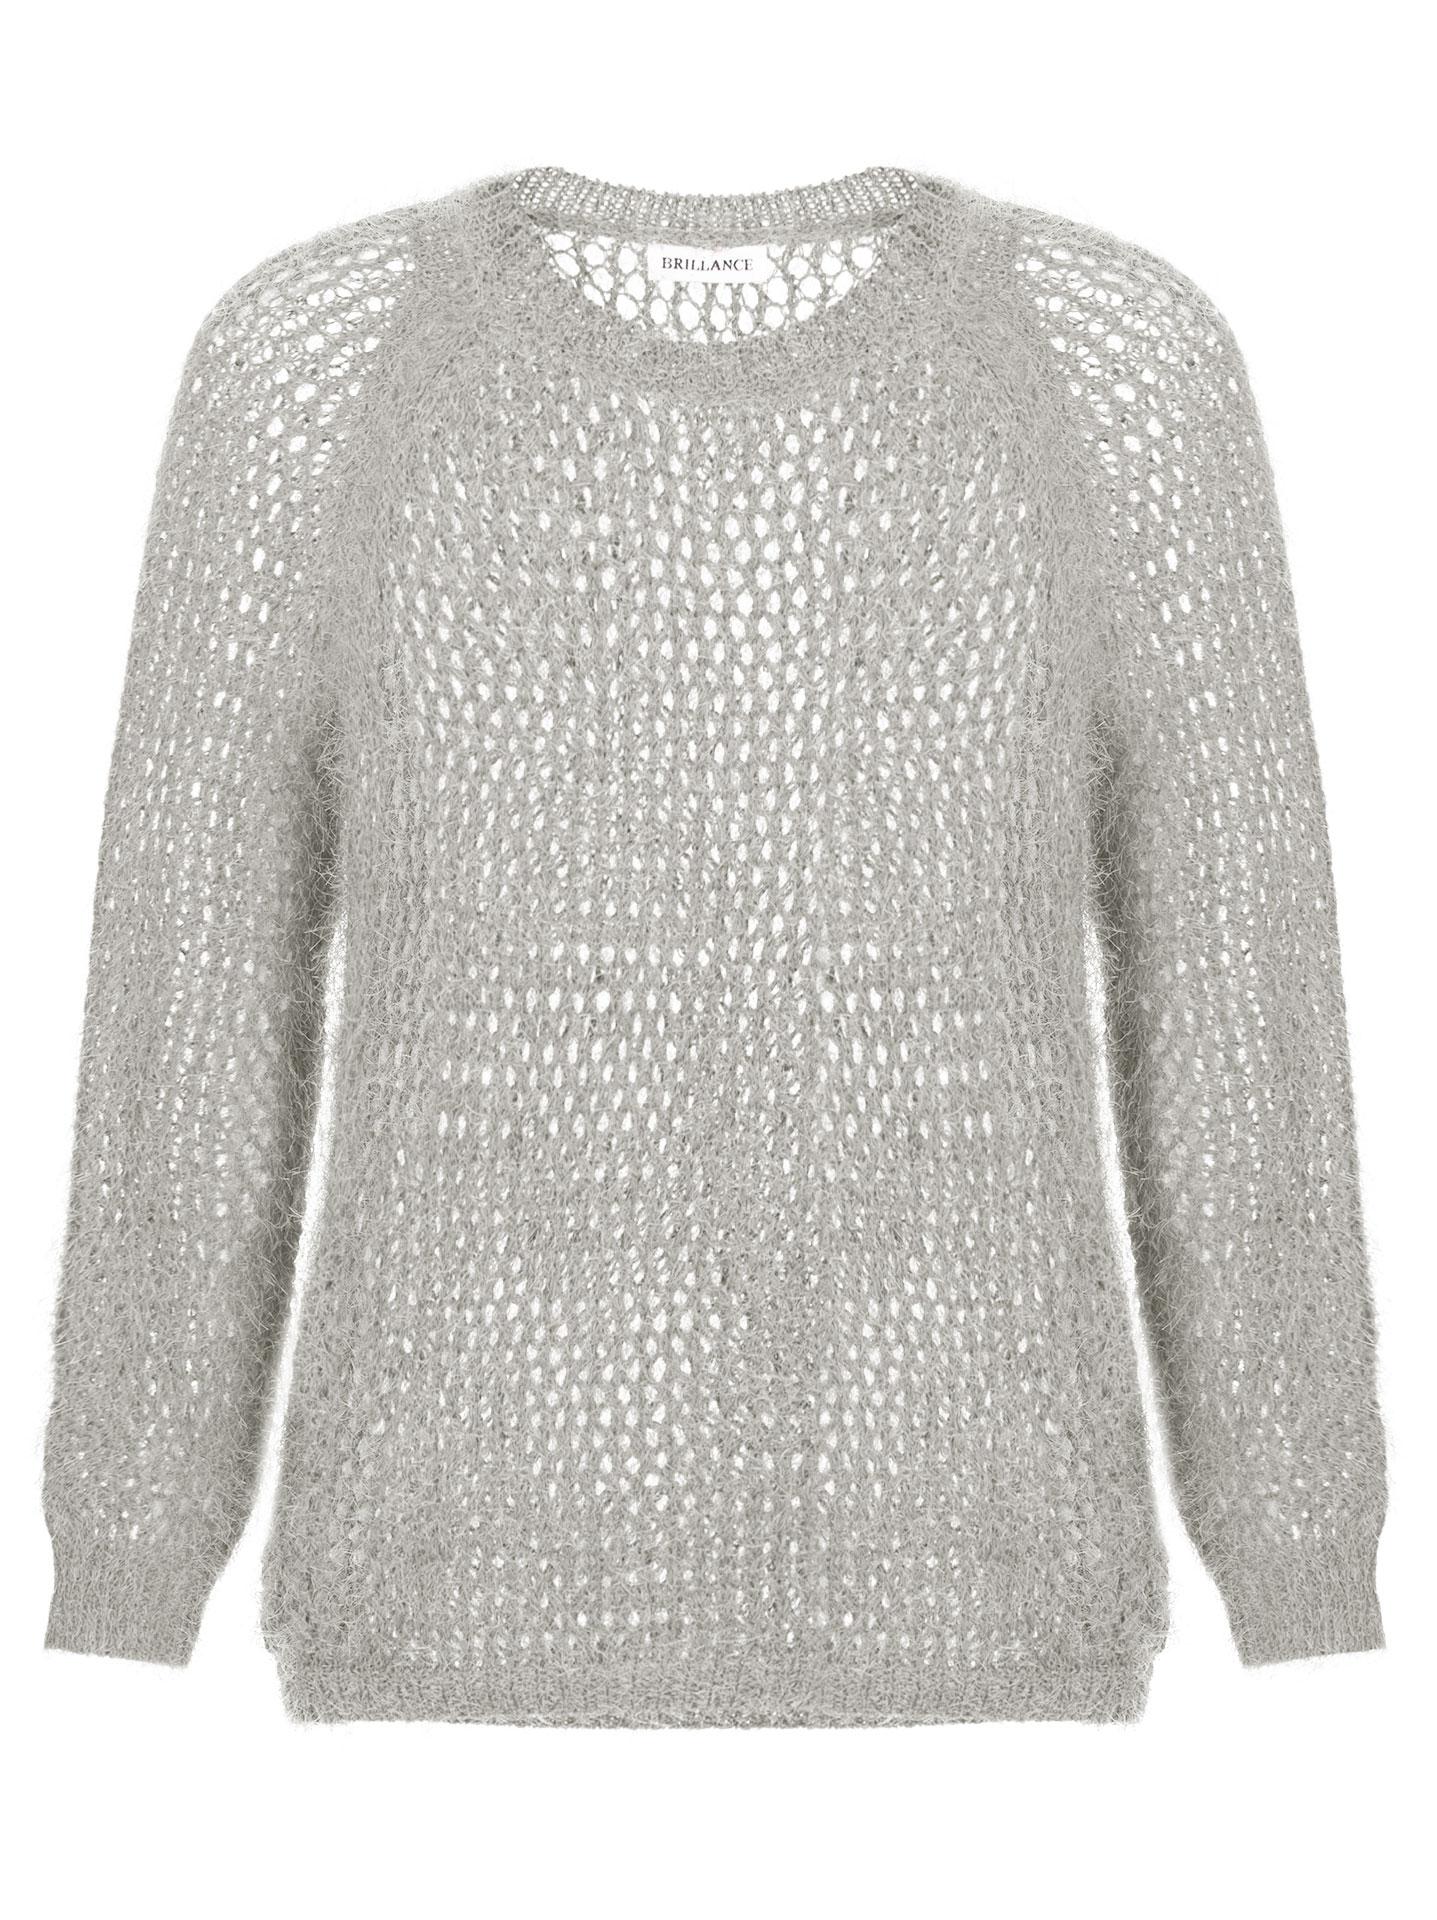 b9ab6e696a75 Χνουδωτό πουλόβερ σε χαλαρή πλέξη σε γκρι